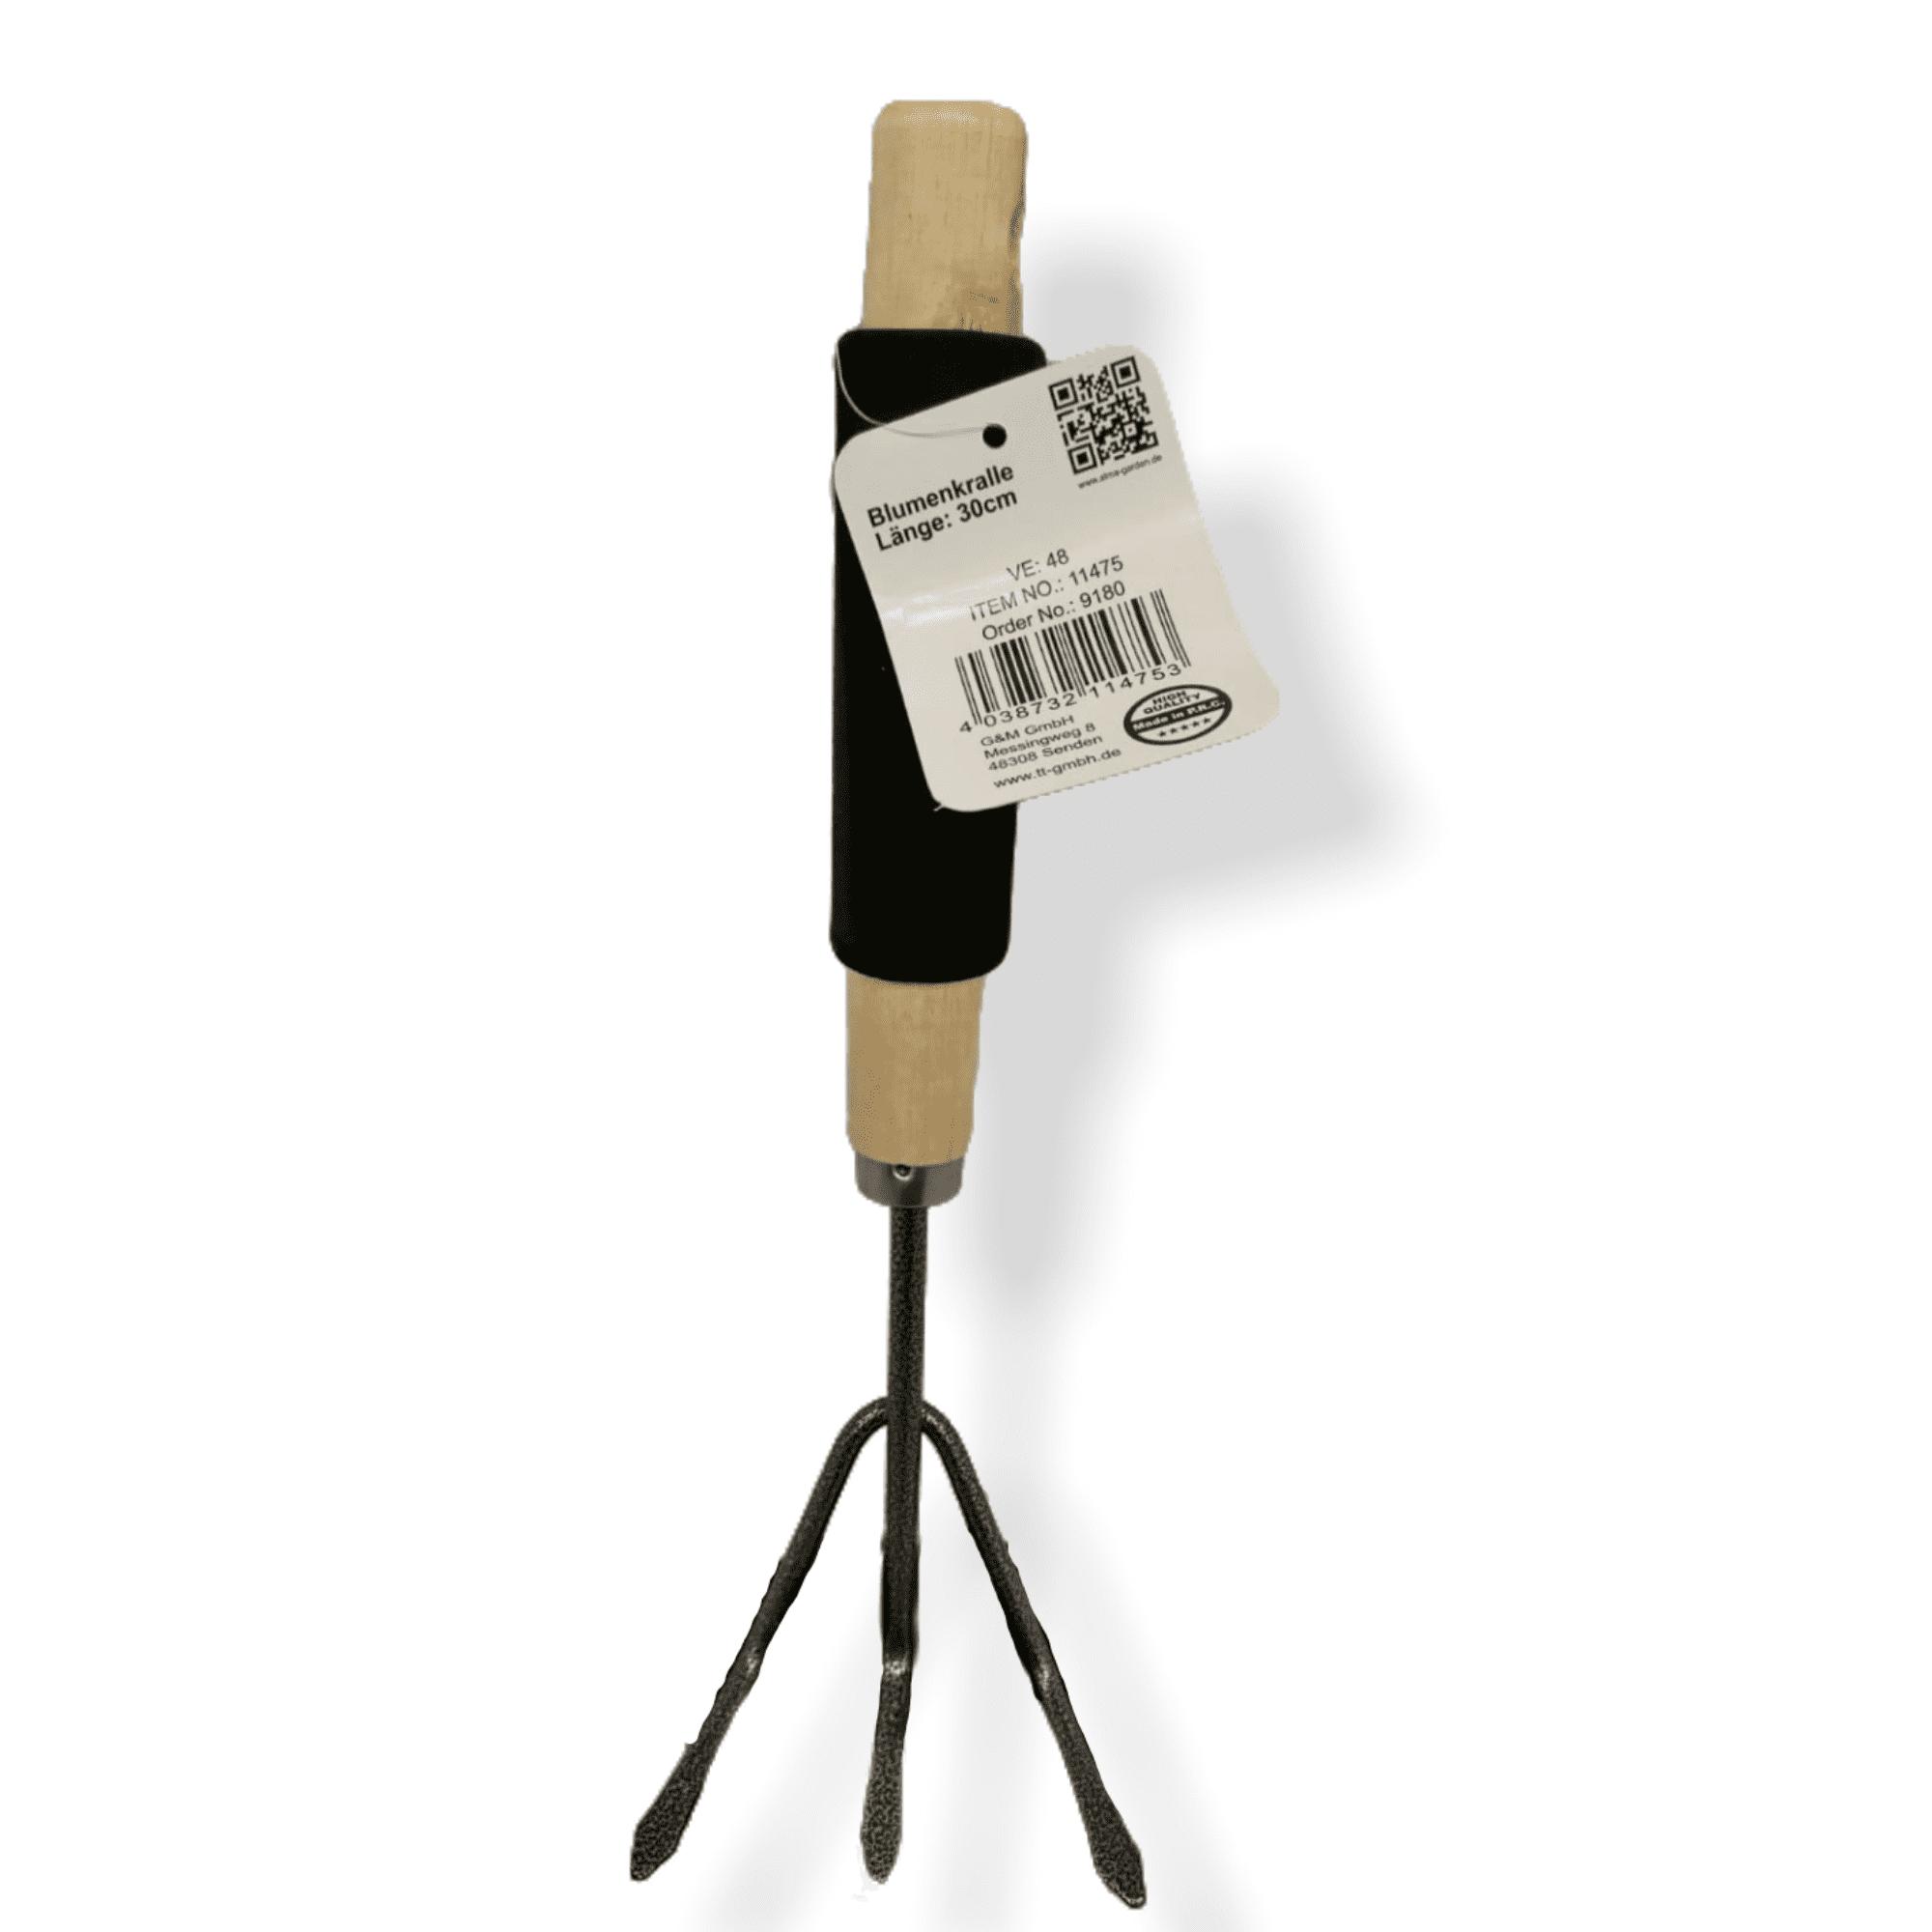 Gartengerät Kralle 30cm 11475